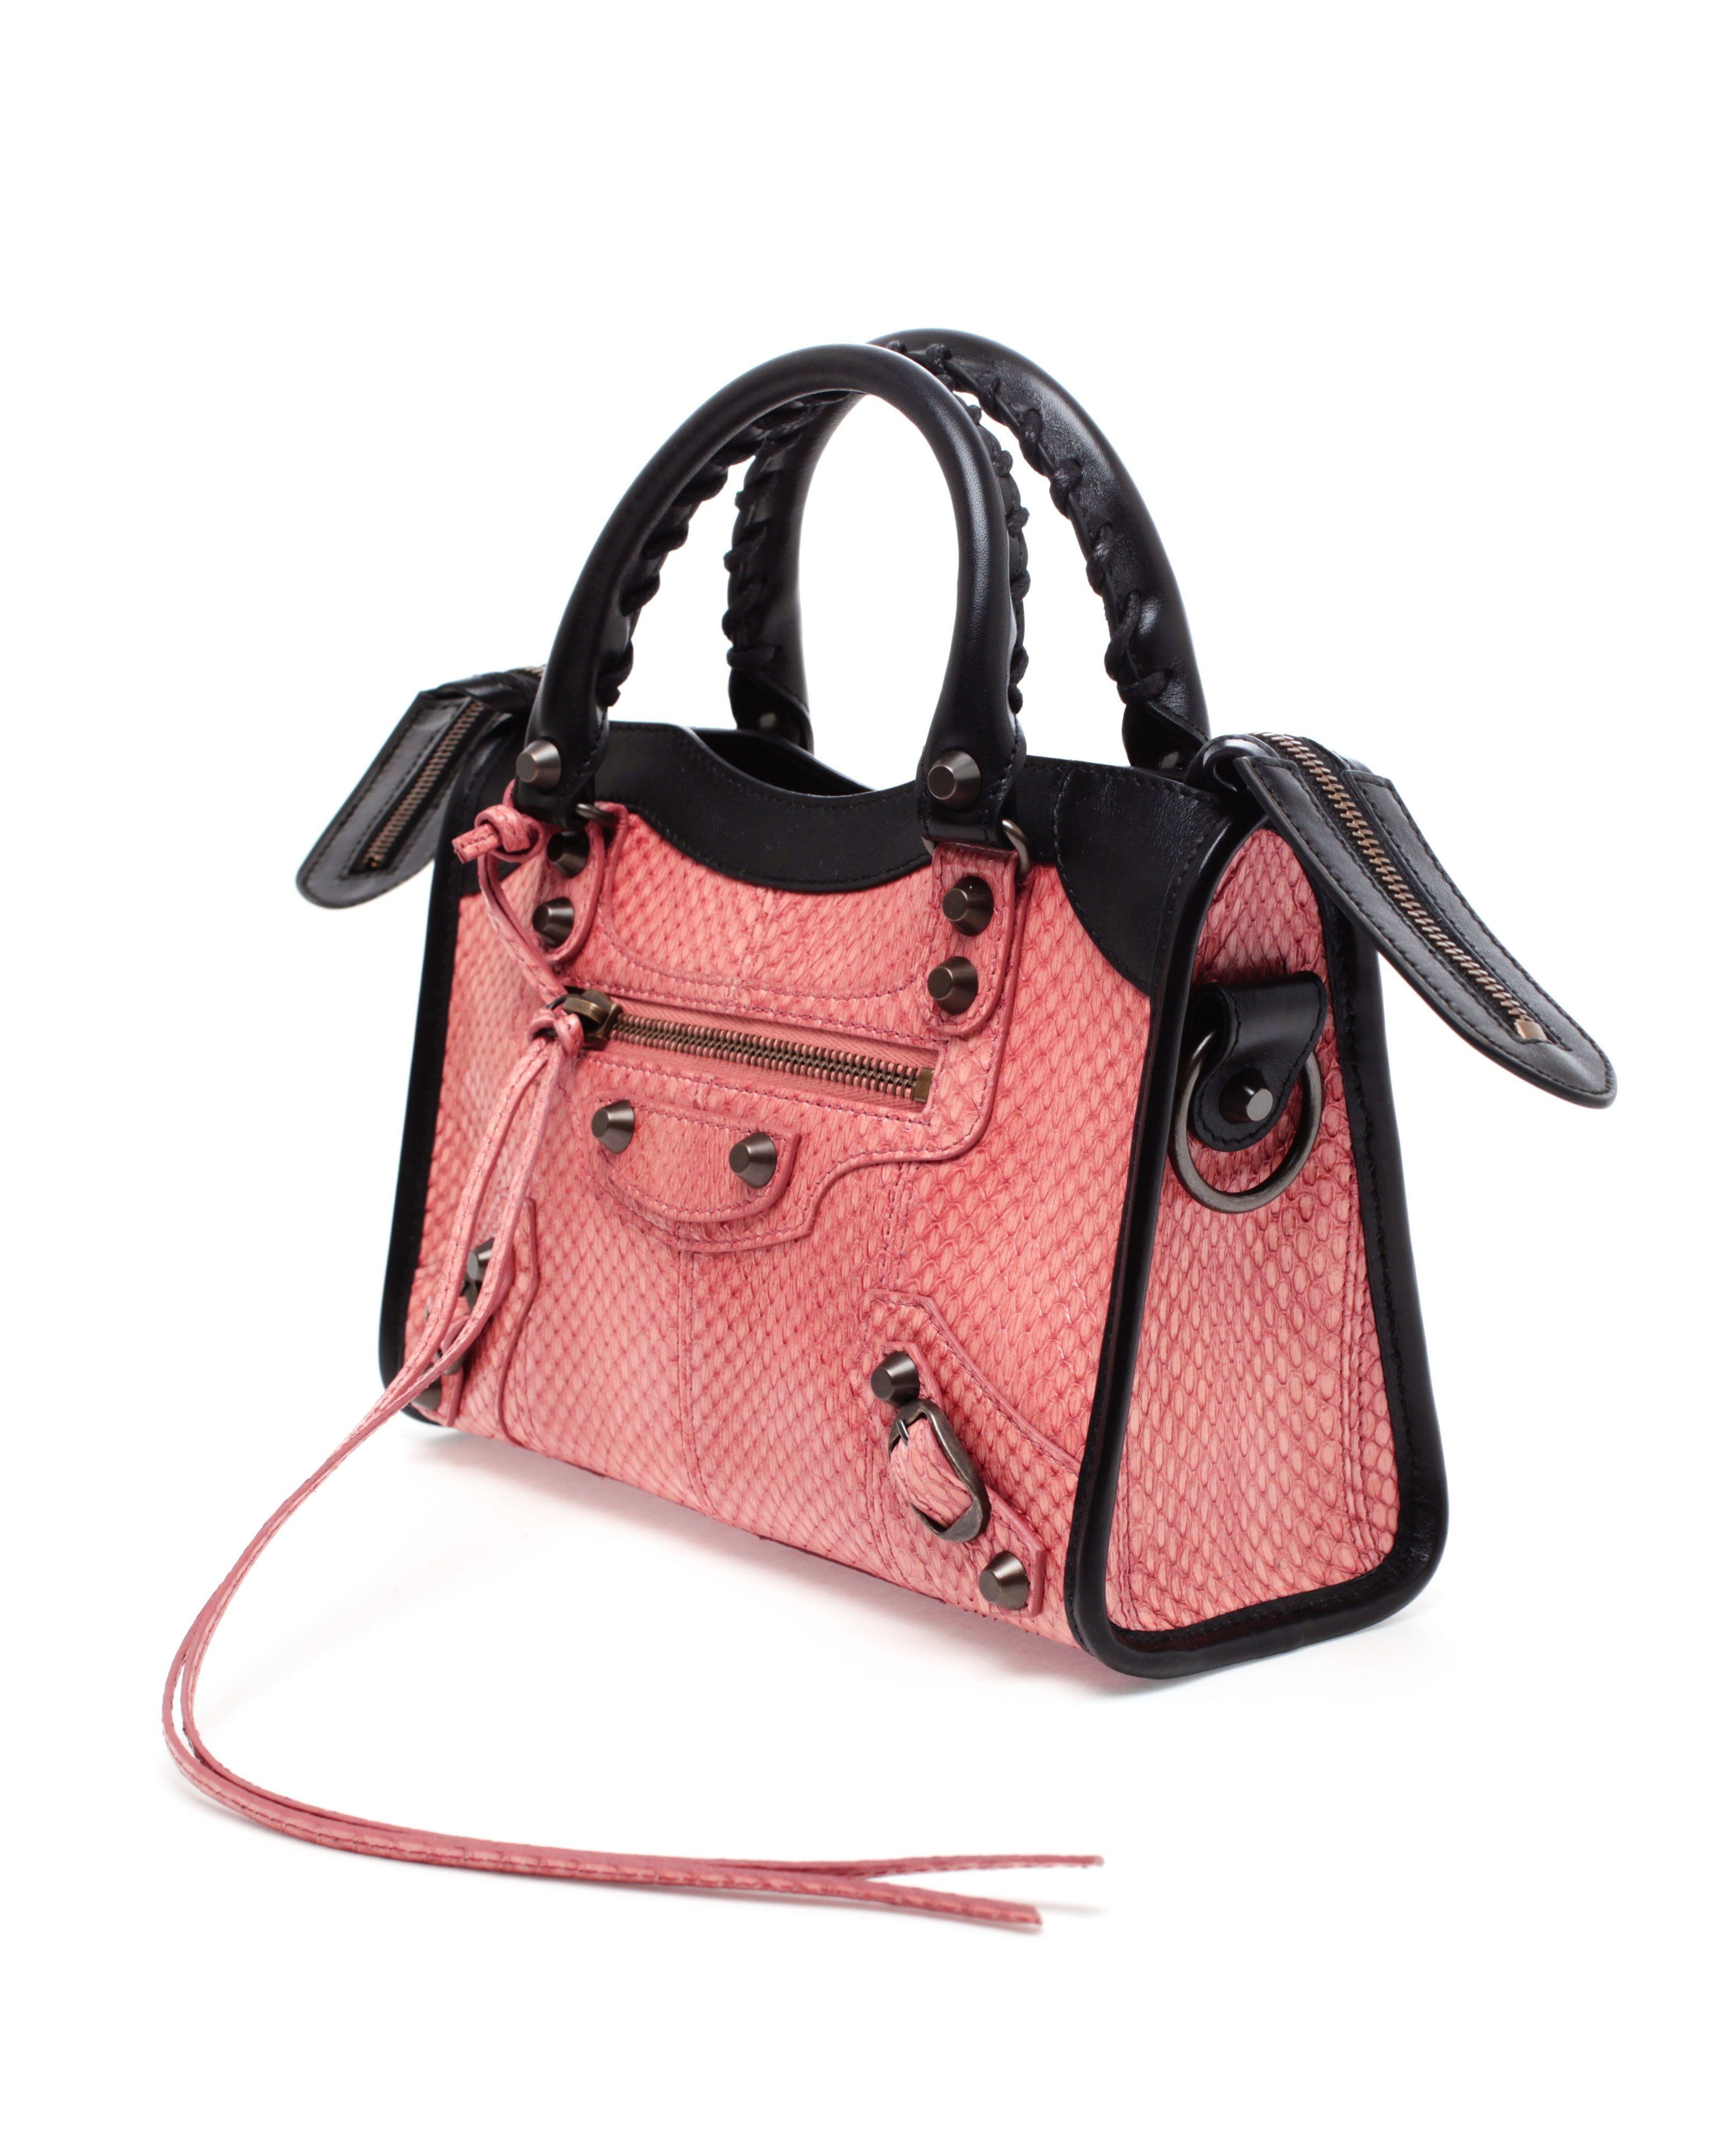 e202b32a8d8 Balenciaga    City  Mini Python and Leather Handbag.   My Style ...